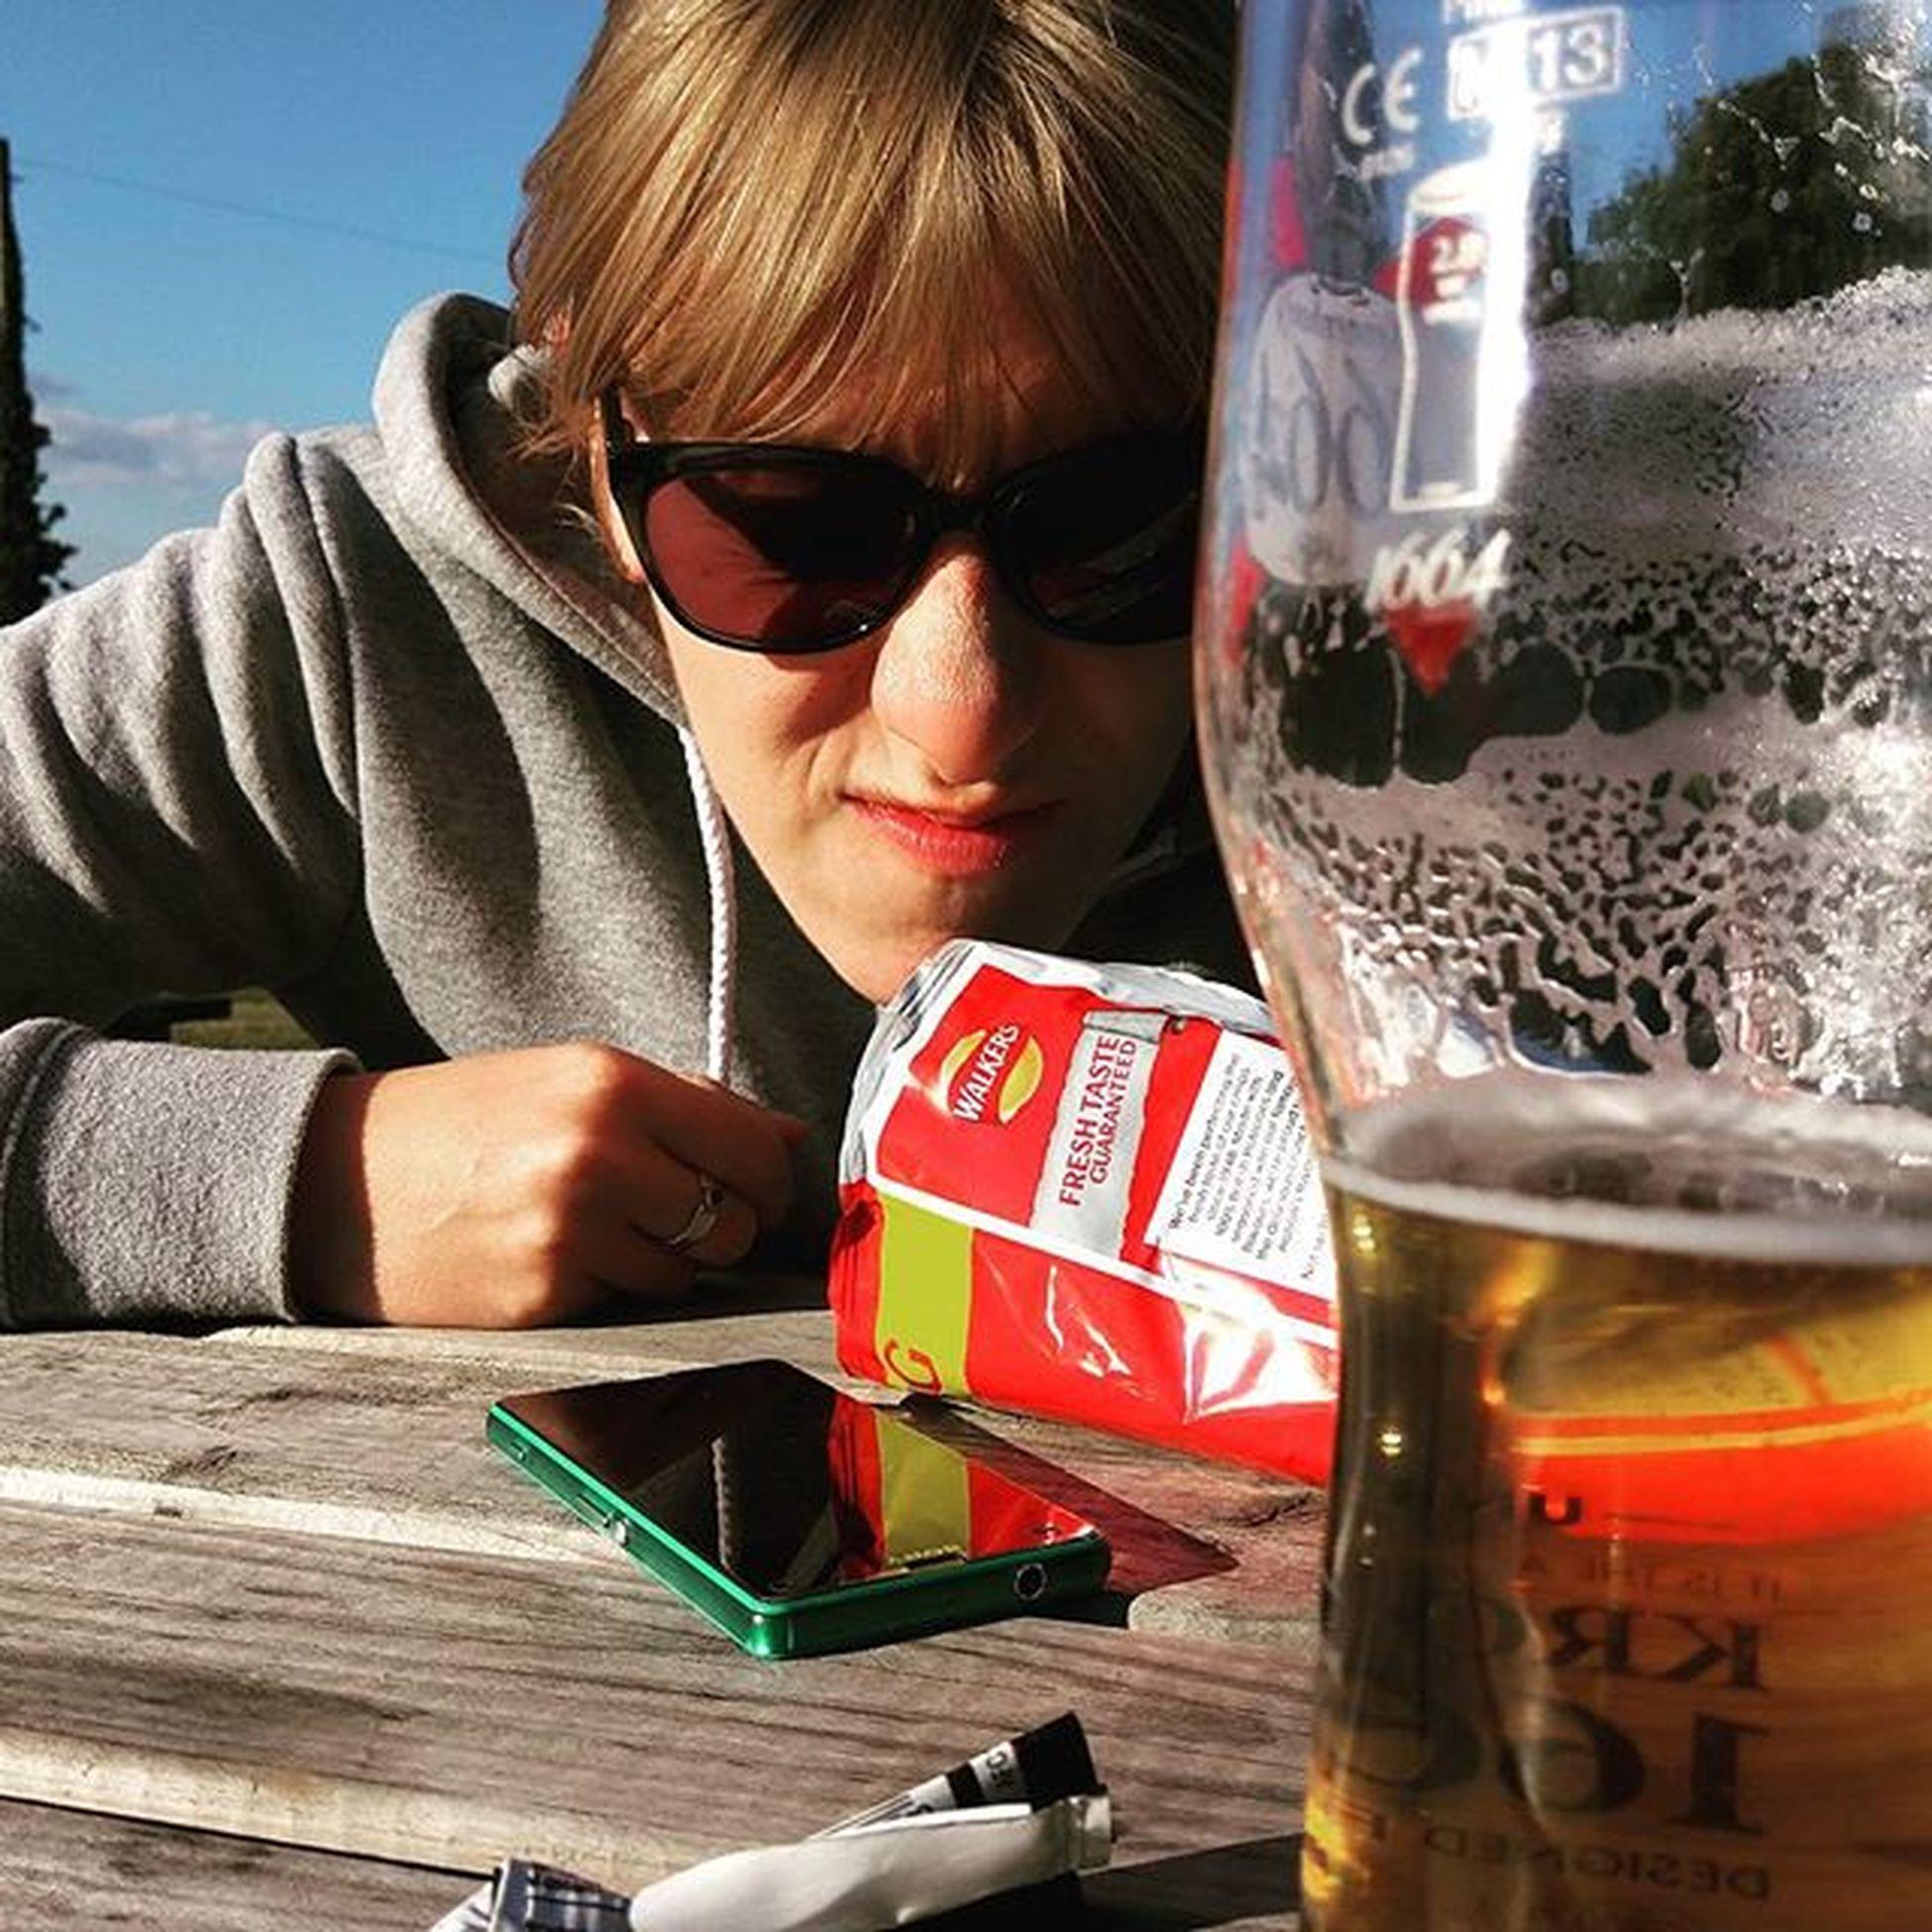 Beertime Thatfridayfeeling RoseAndCrown Severnstoke